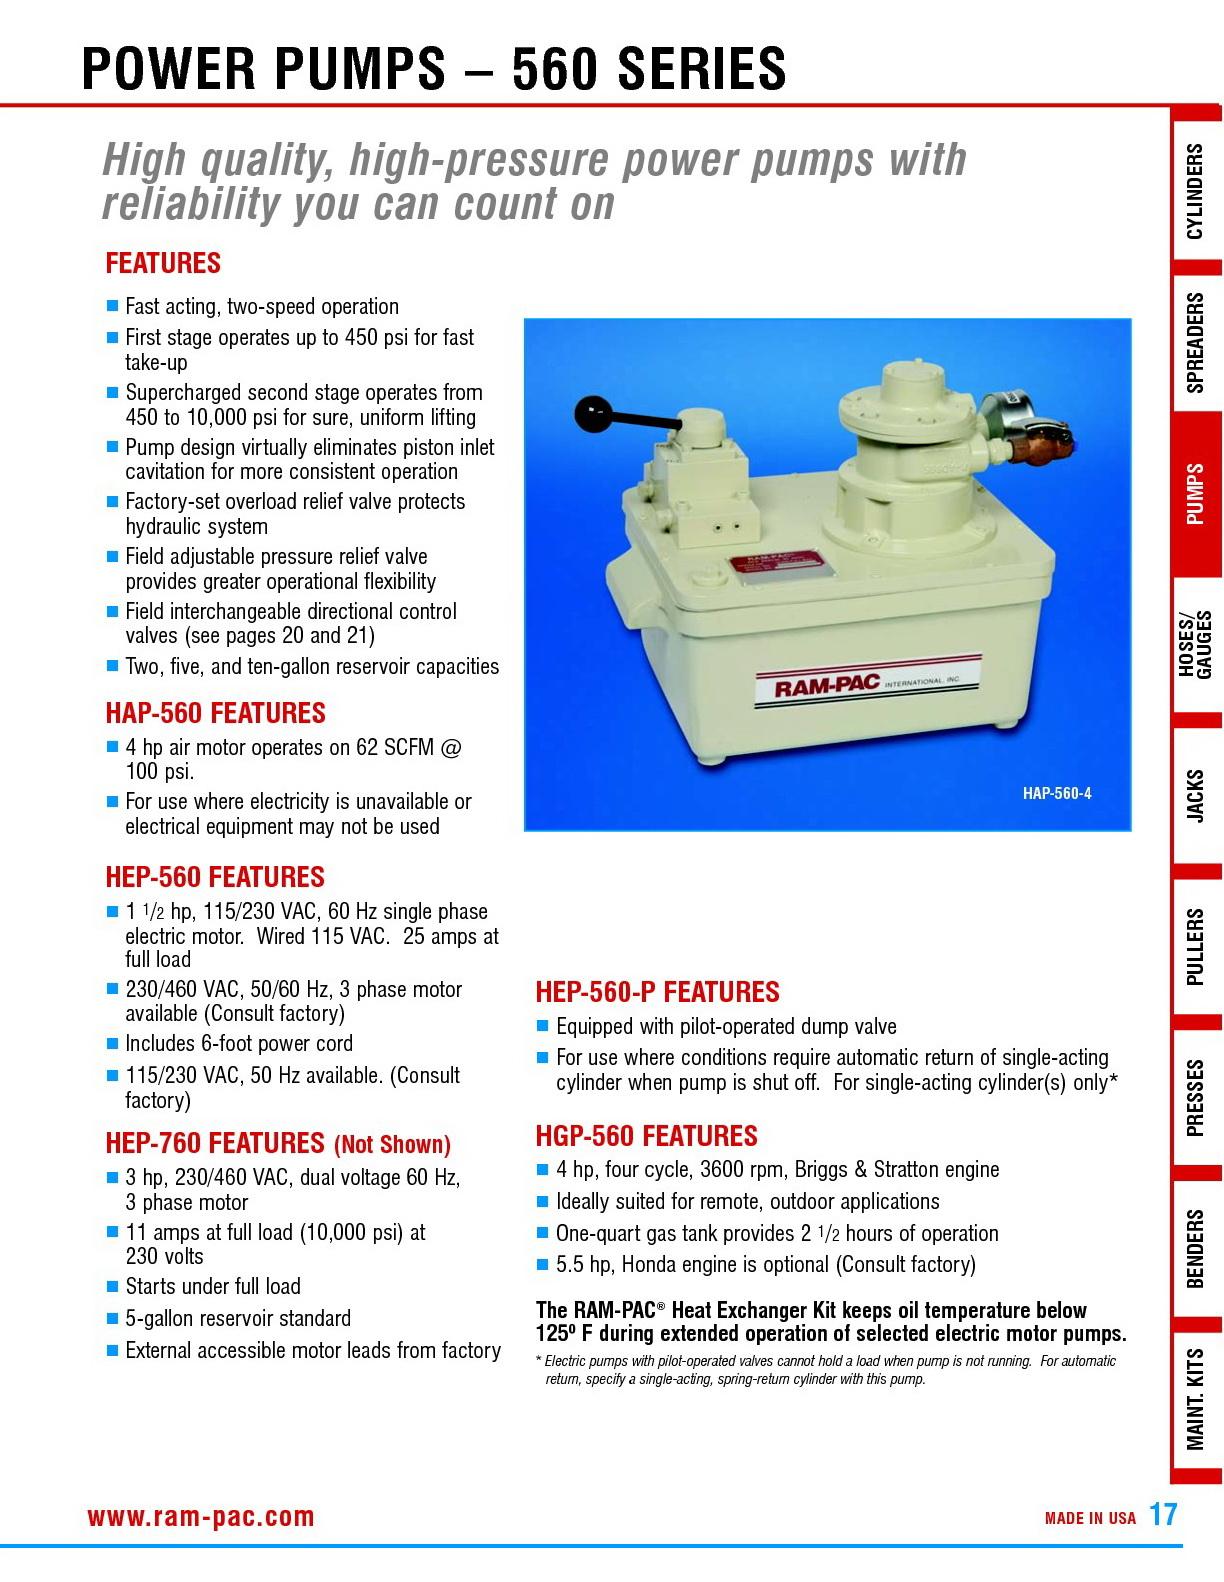 RAM PAC HYDRAULIC TOOLS - BEST HARDWARE CO ,LTD ขาย-ติดตั้ง เครื่อง